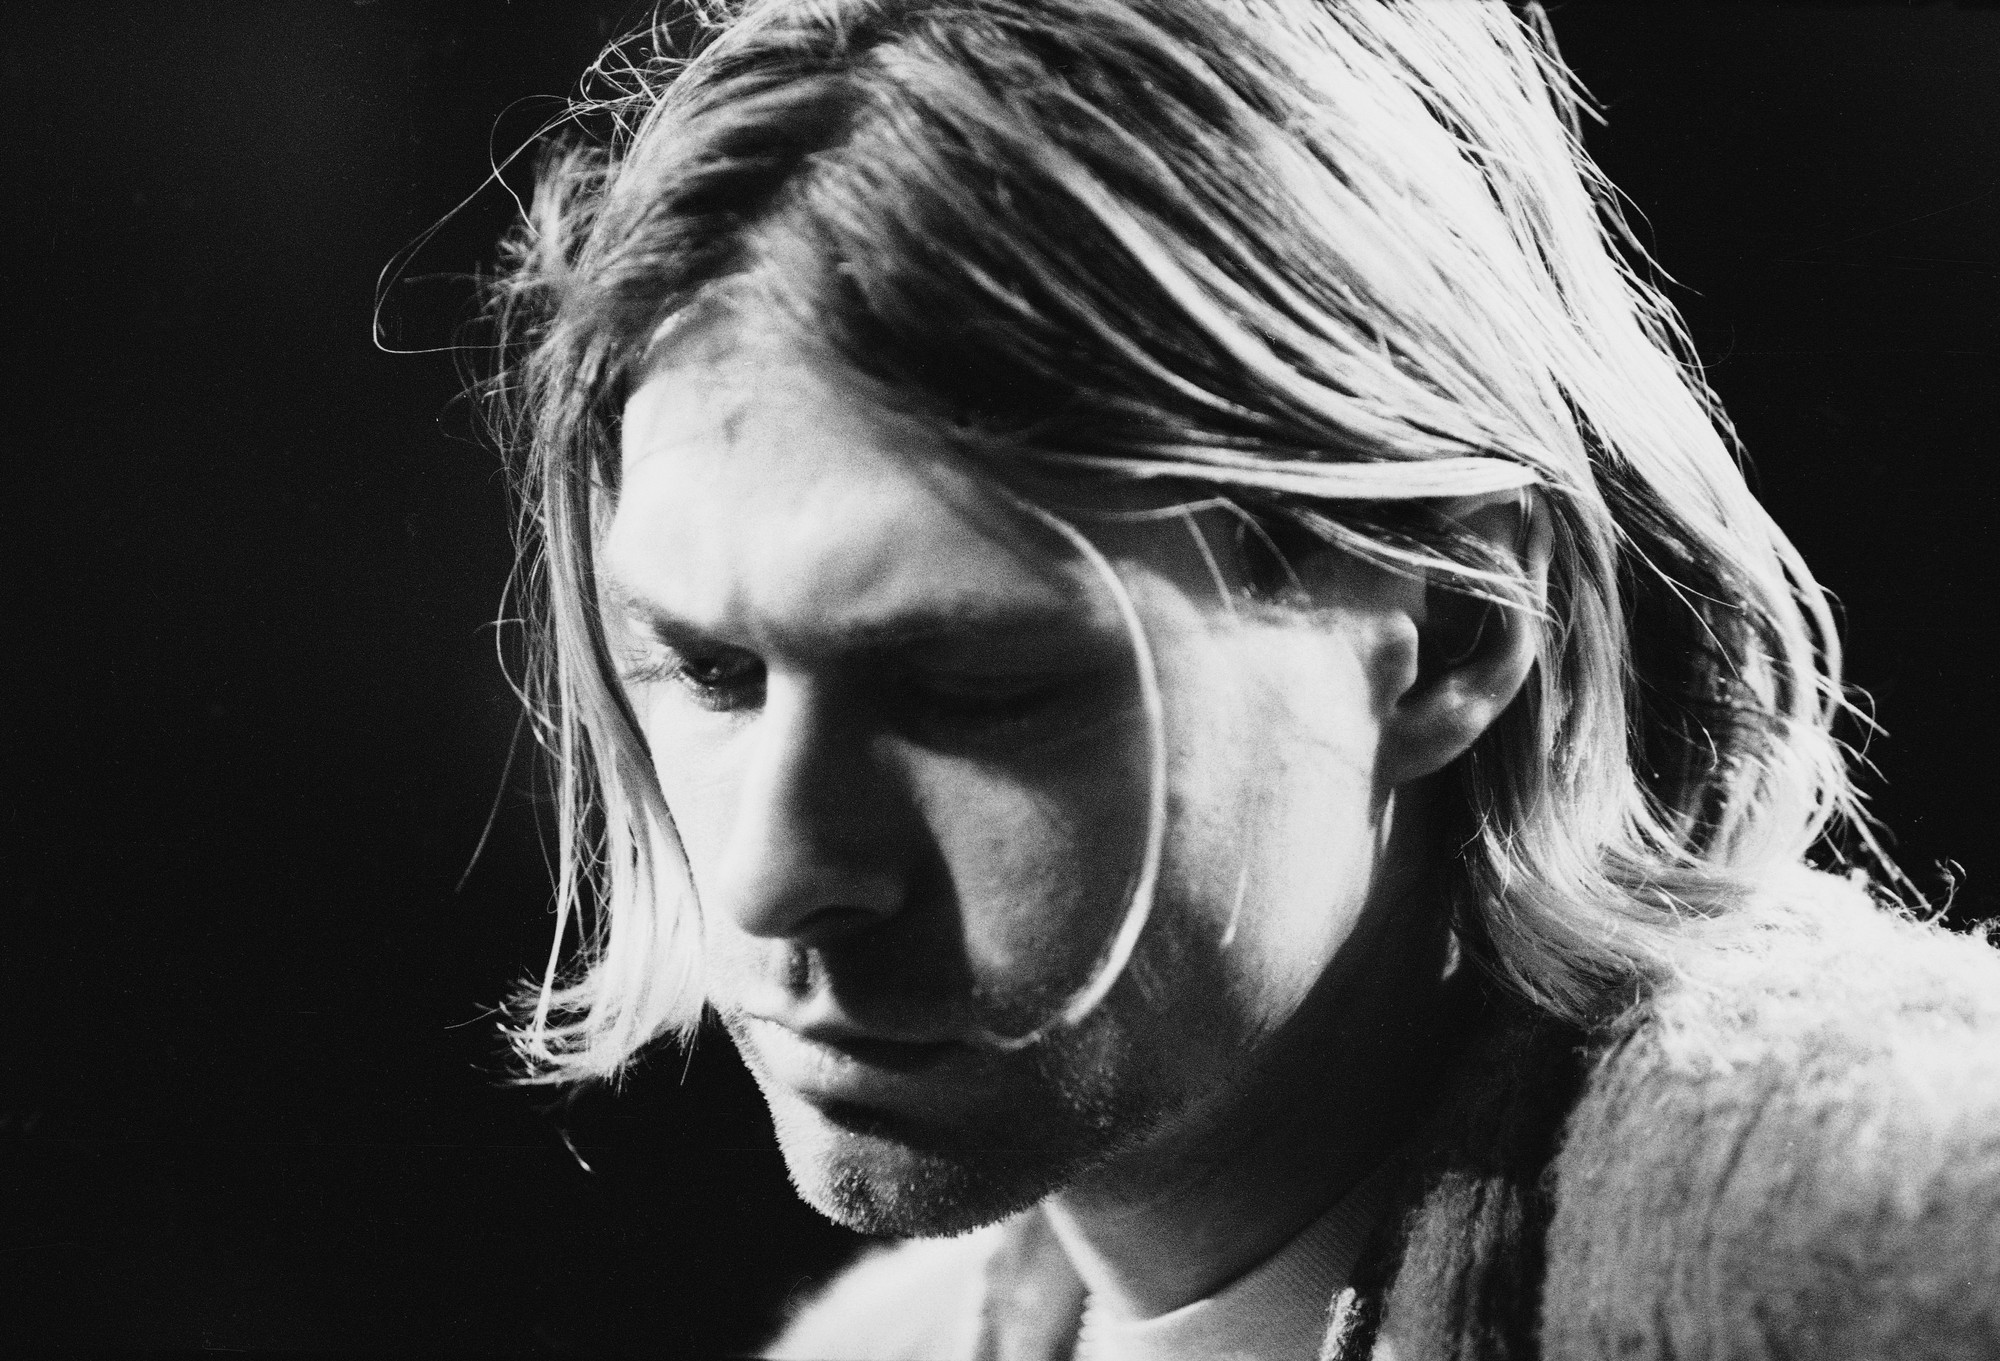 Kurt Cobain cumpliría hoy 45 años